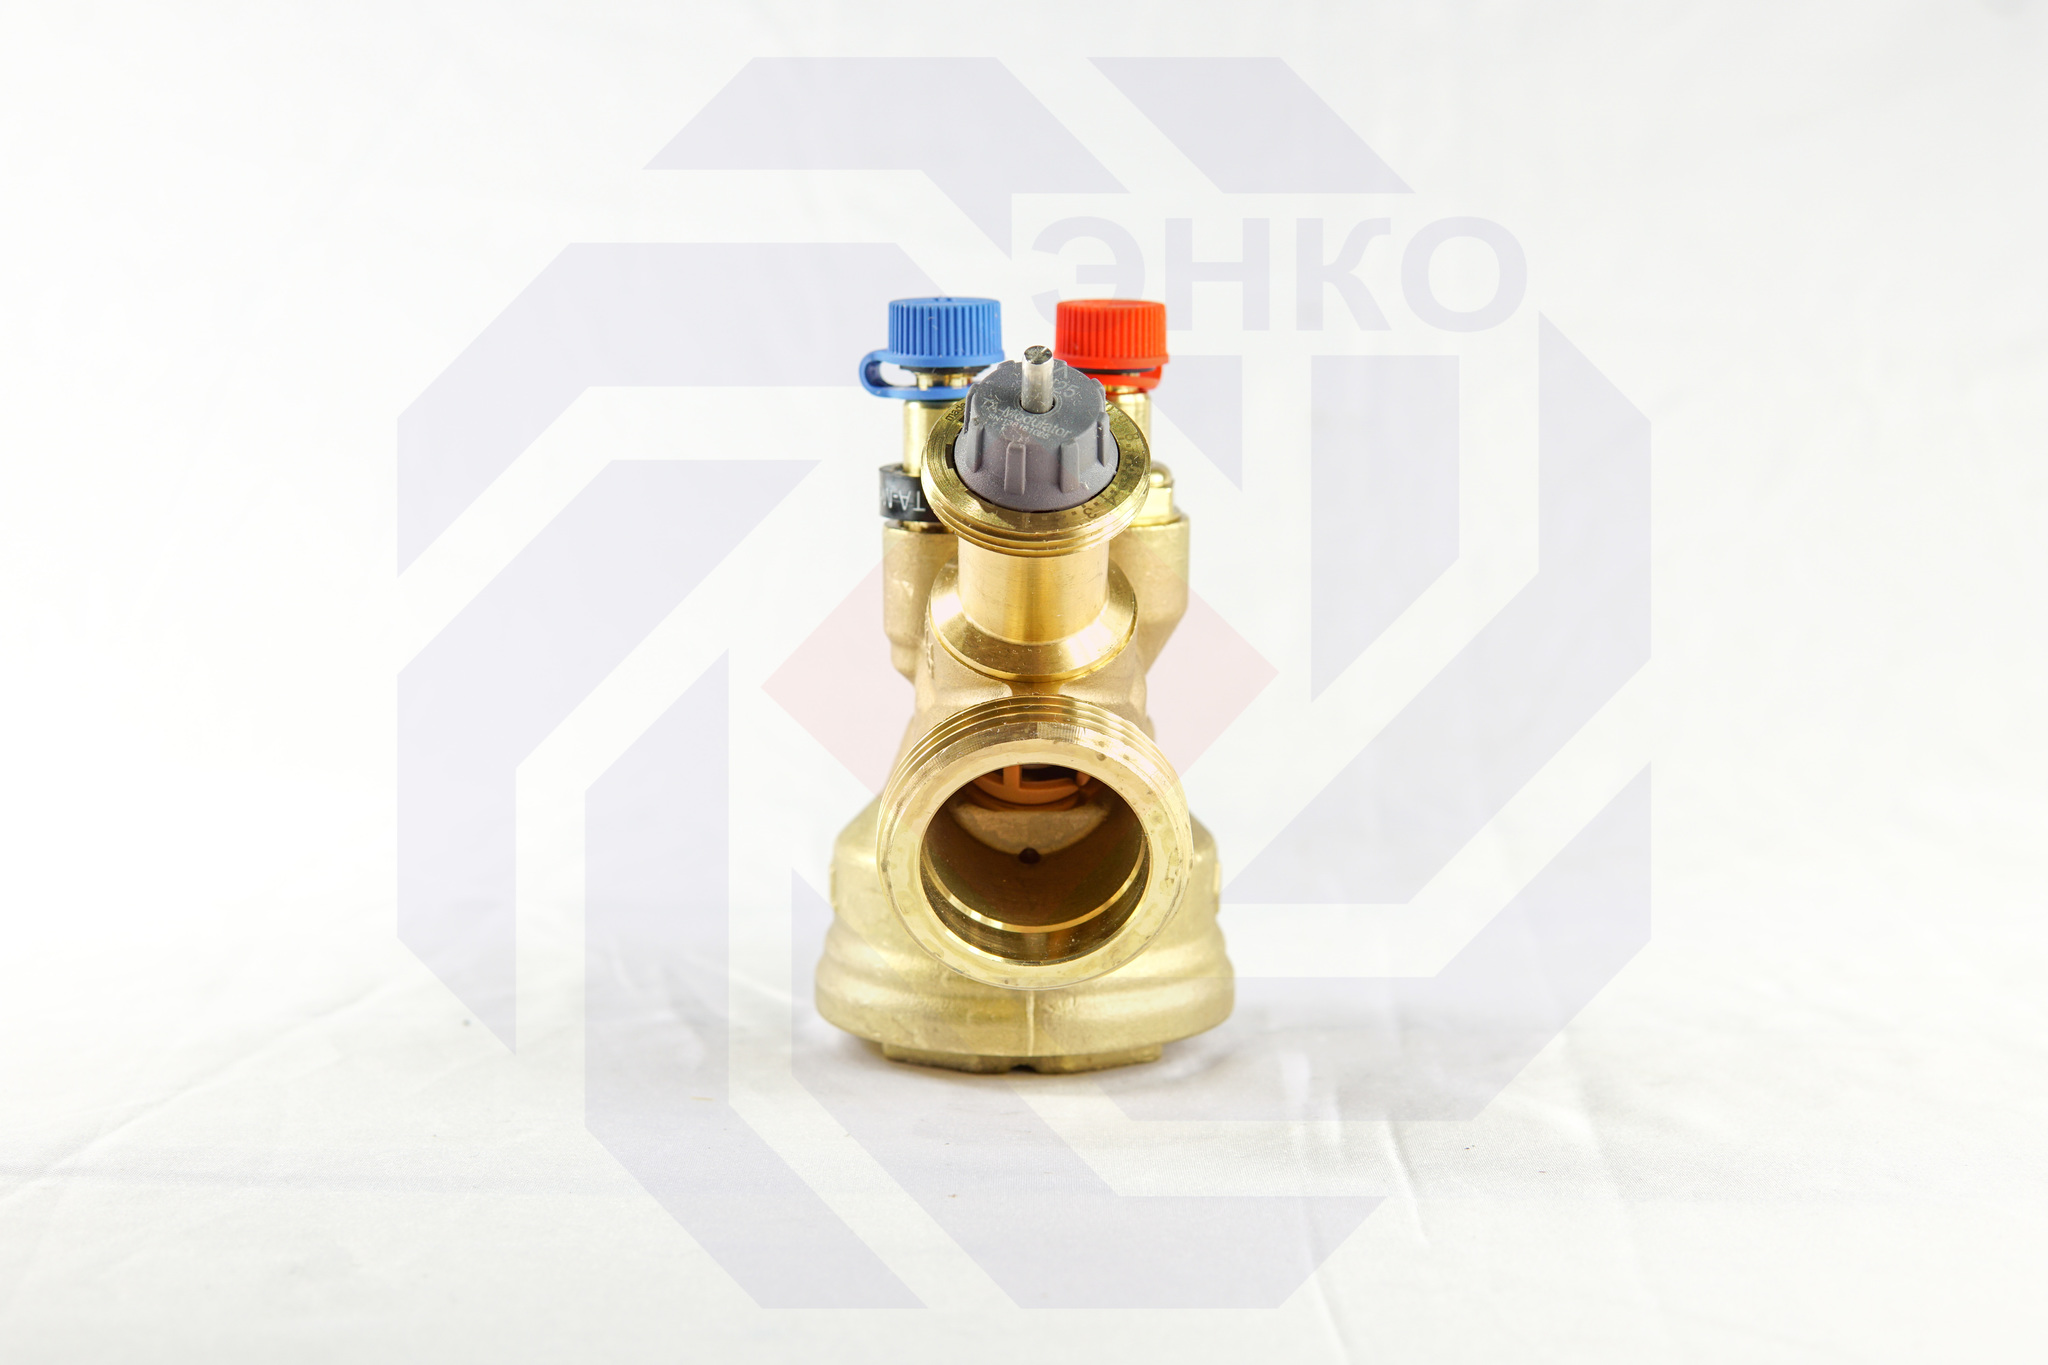 Клапан балансировочный и регулирующий IMI TA-Modulator DN 25